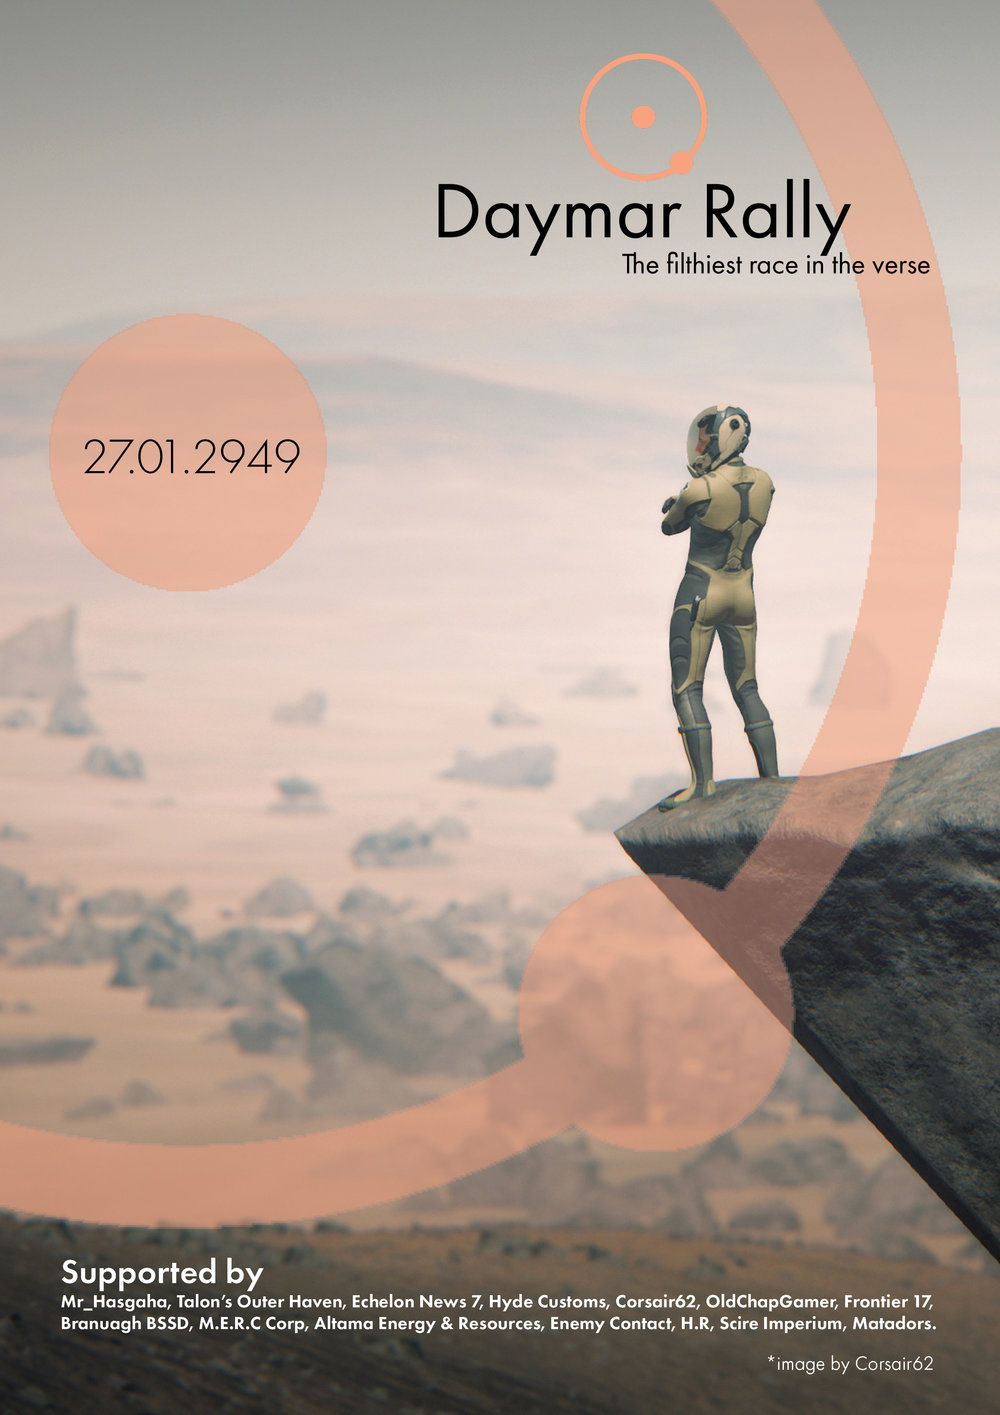 DaymarRally_Poster2.jpg